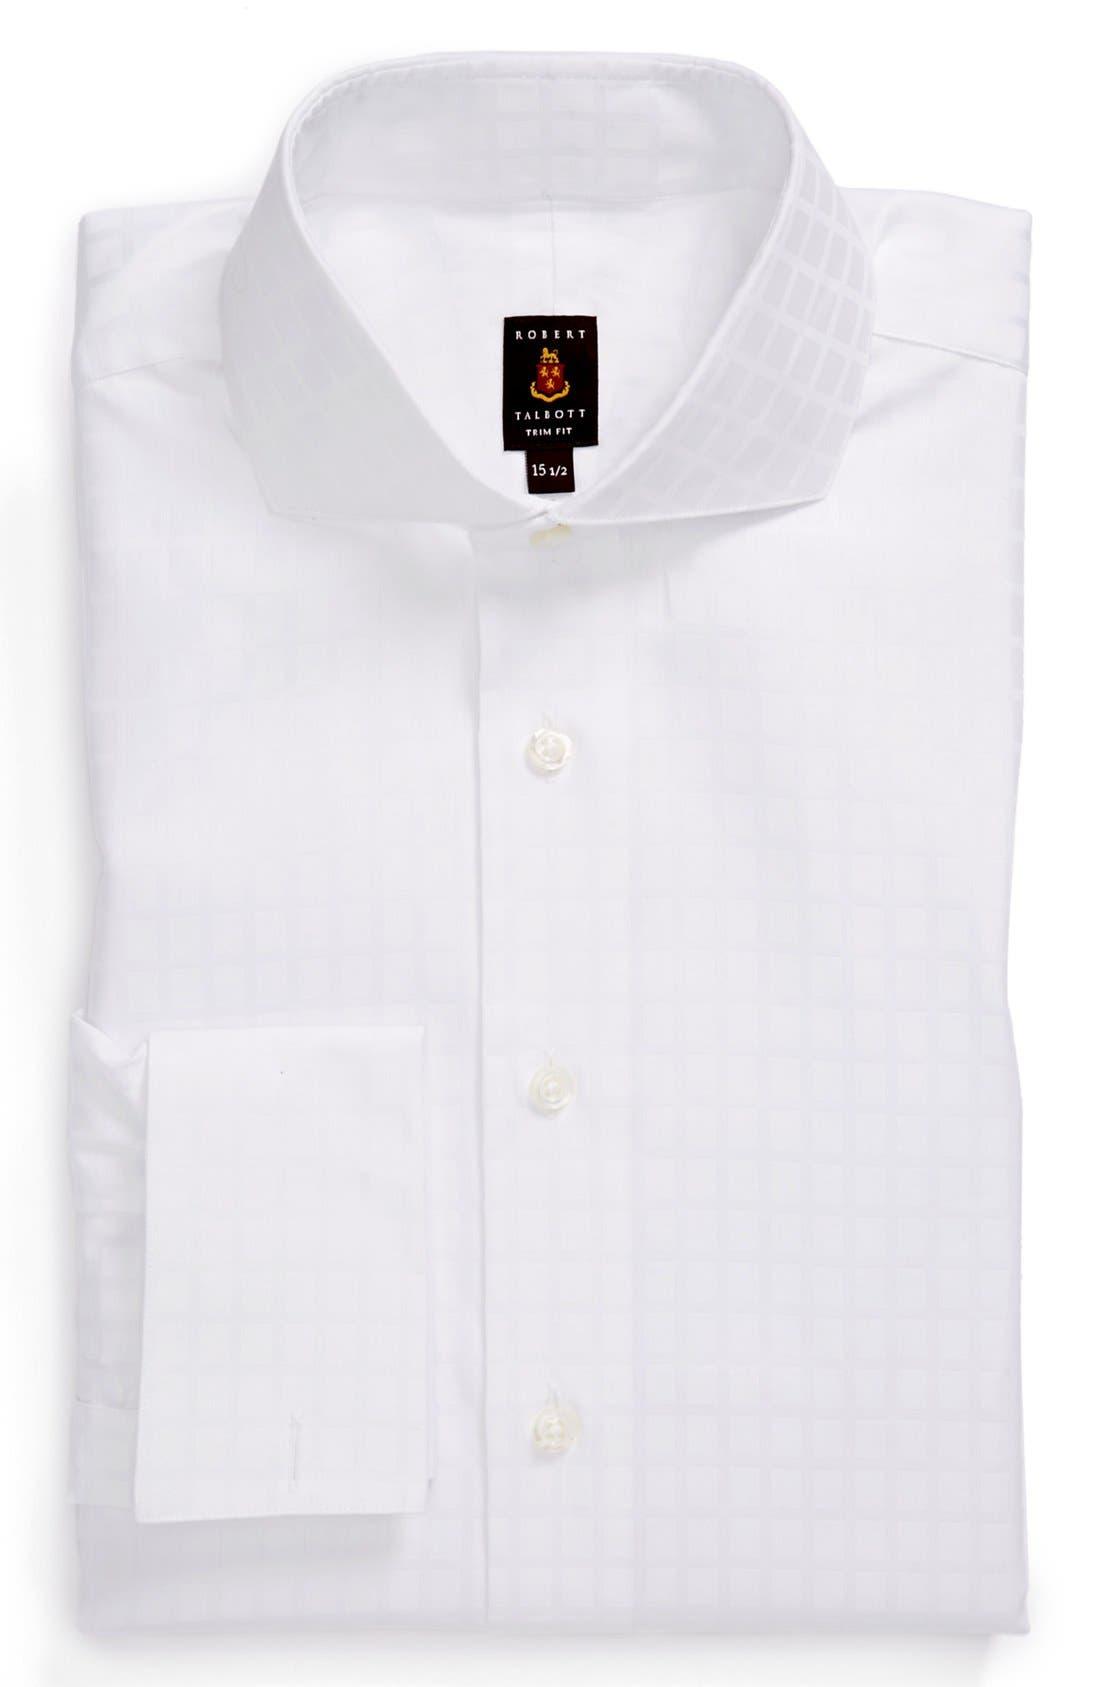 Main Image - Robert Talbott Trim Fit Dress Shirt